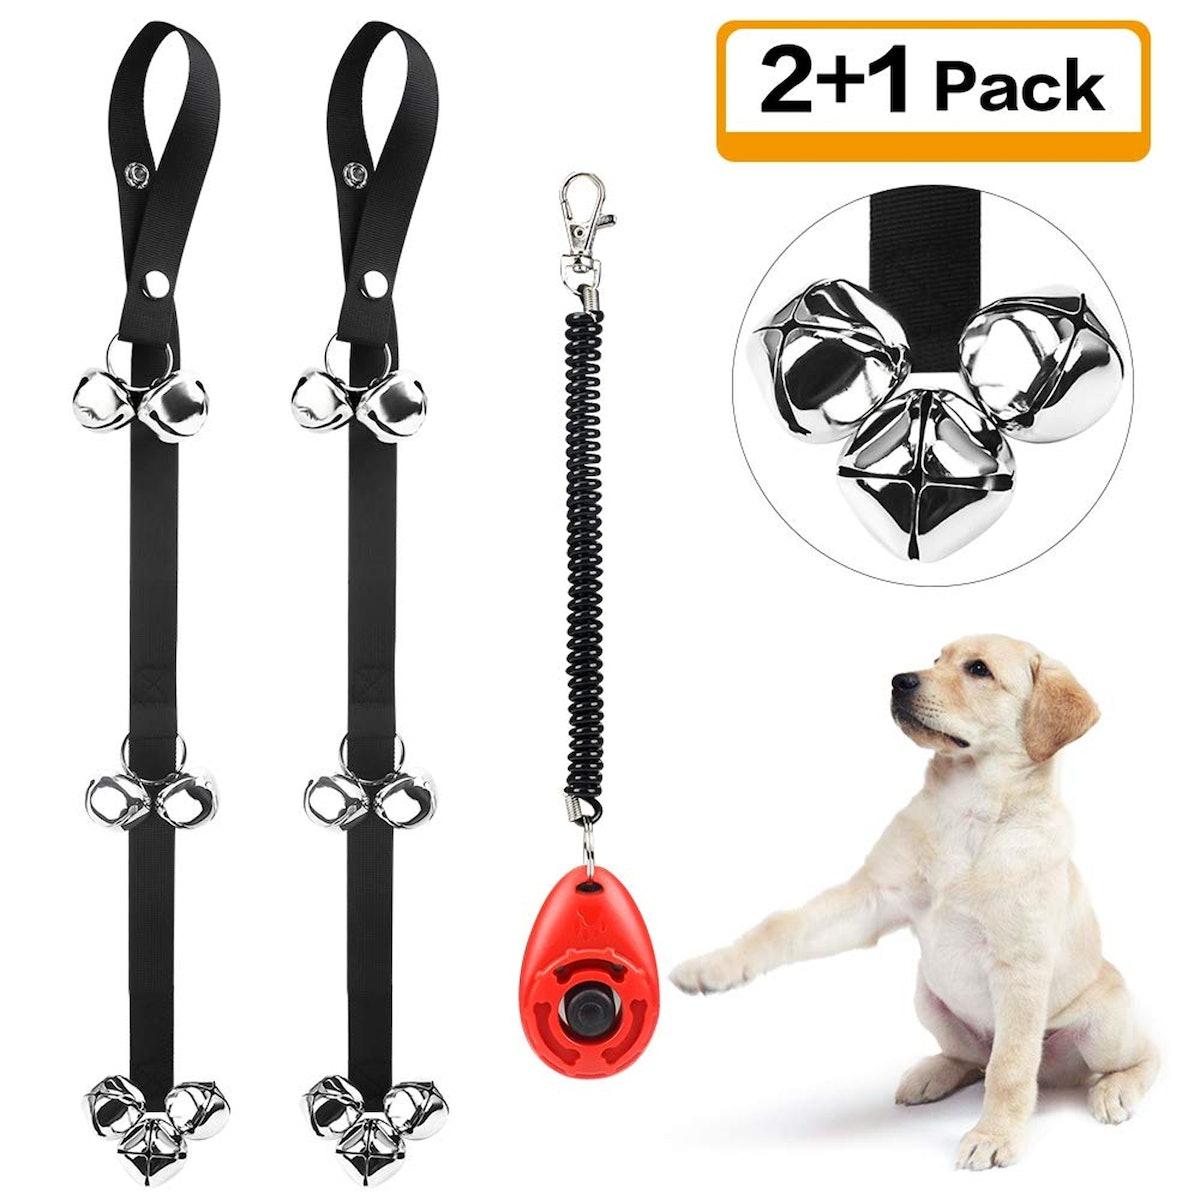 Kytely Dog Doorbells (2 Pack)